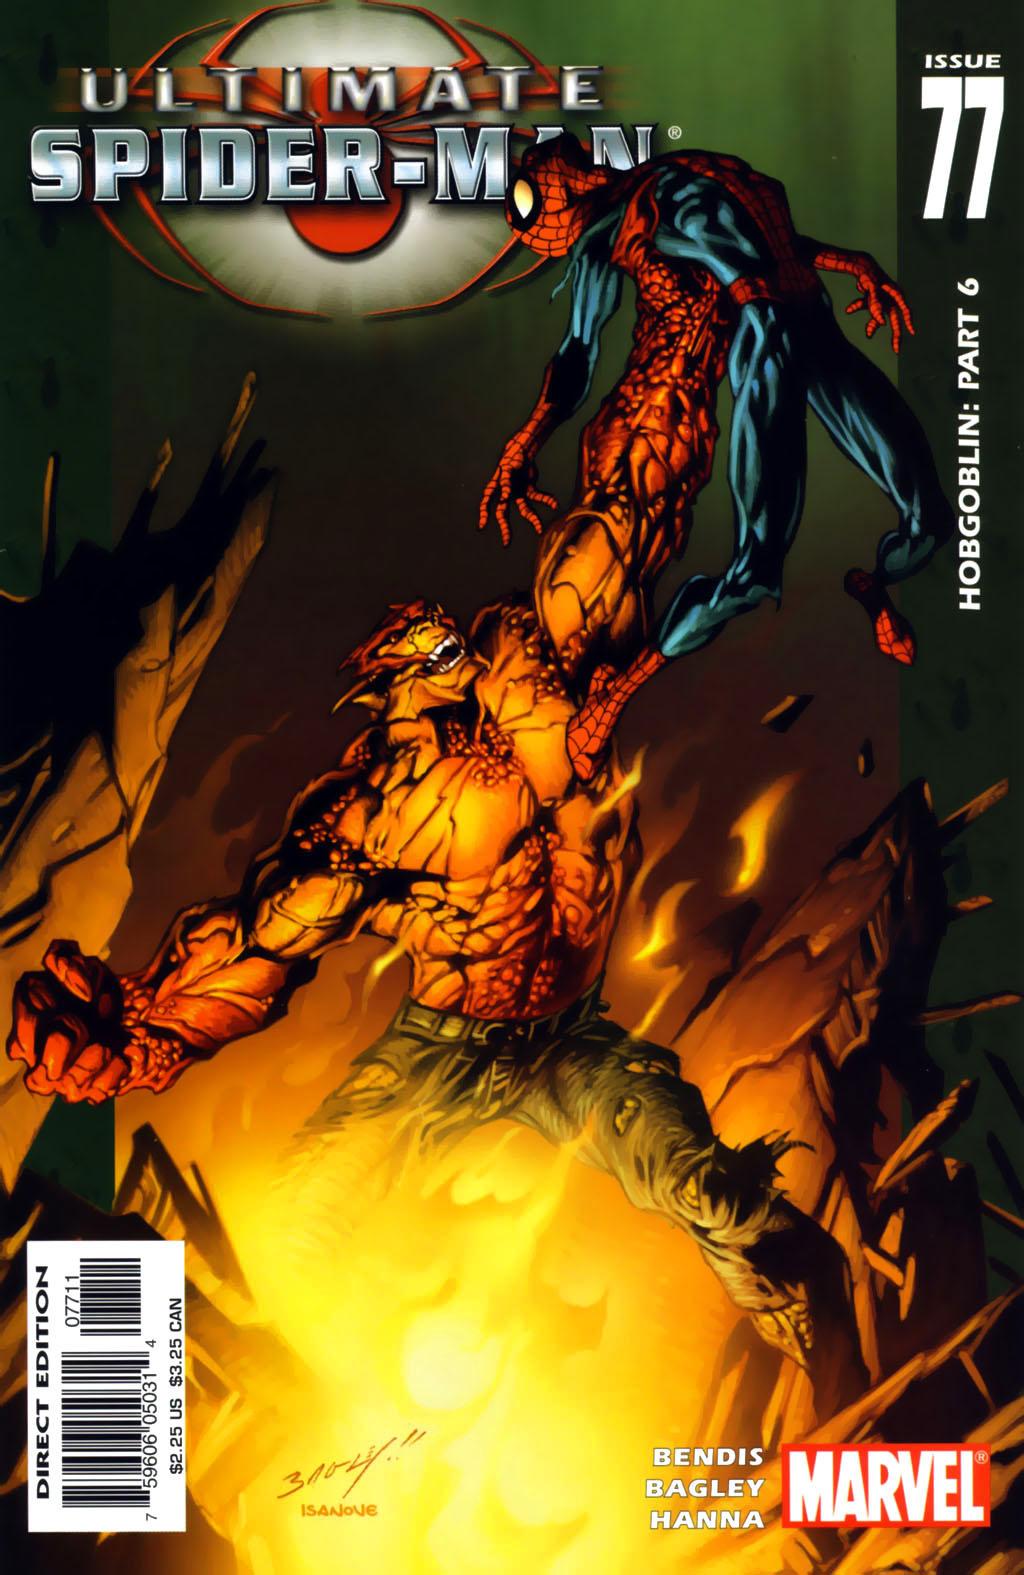 Ultimate Spider-Man 77 - 00